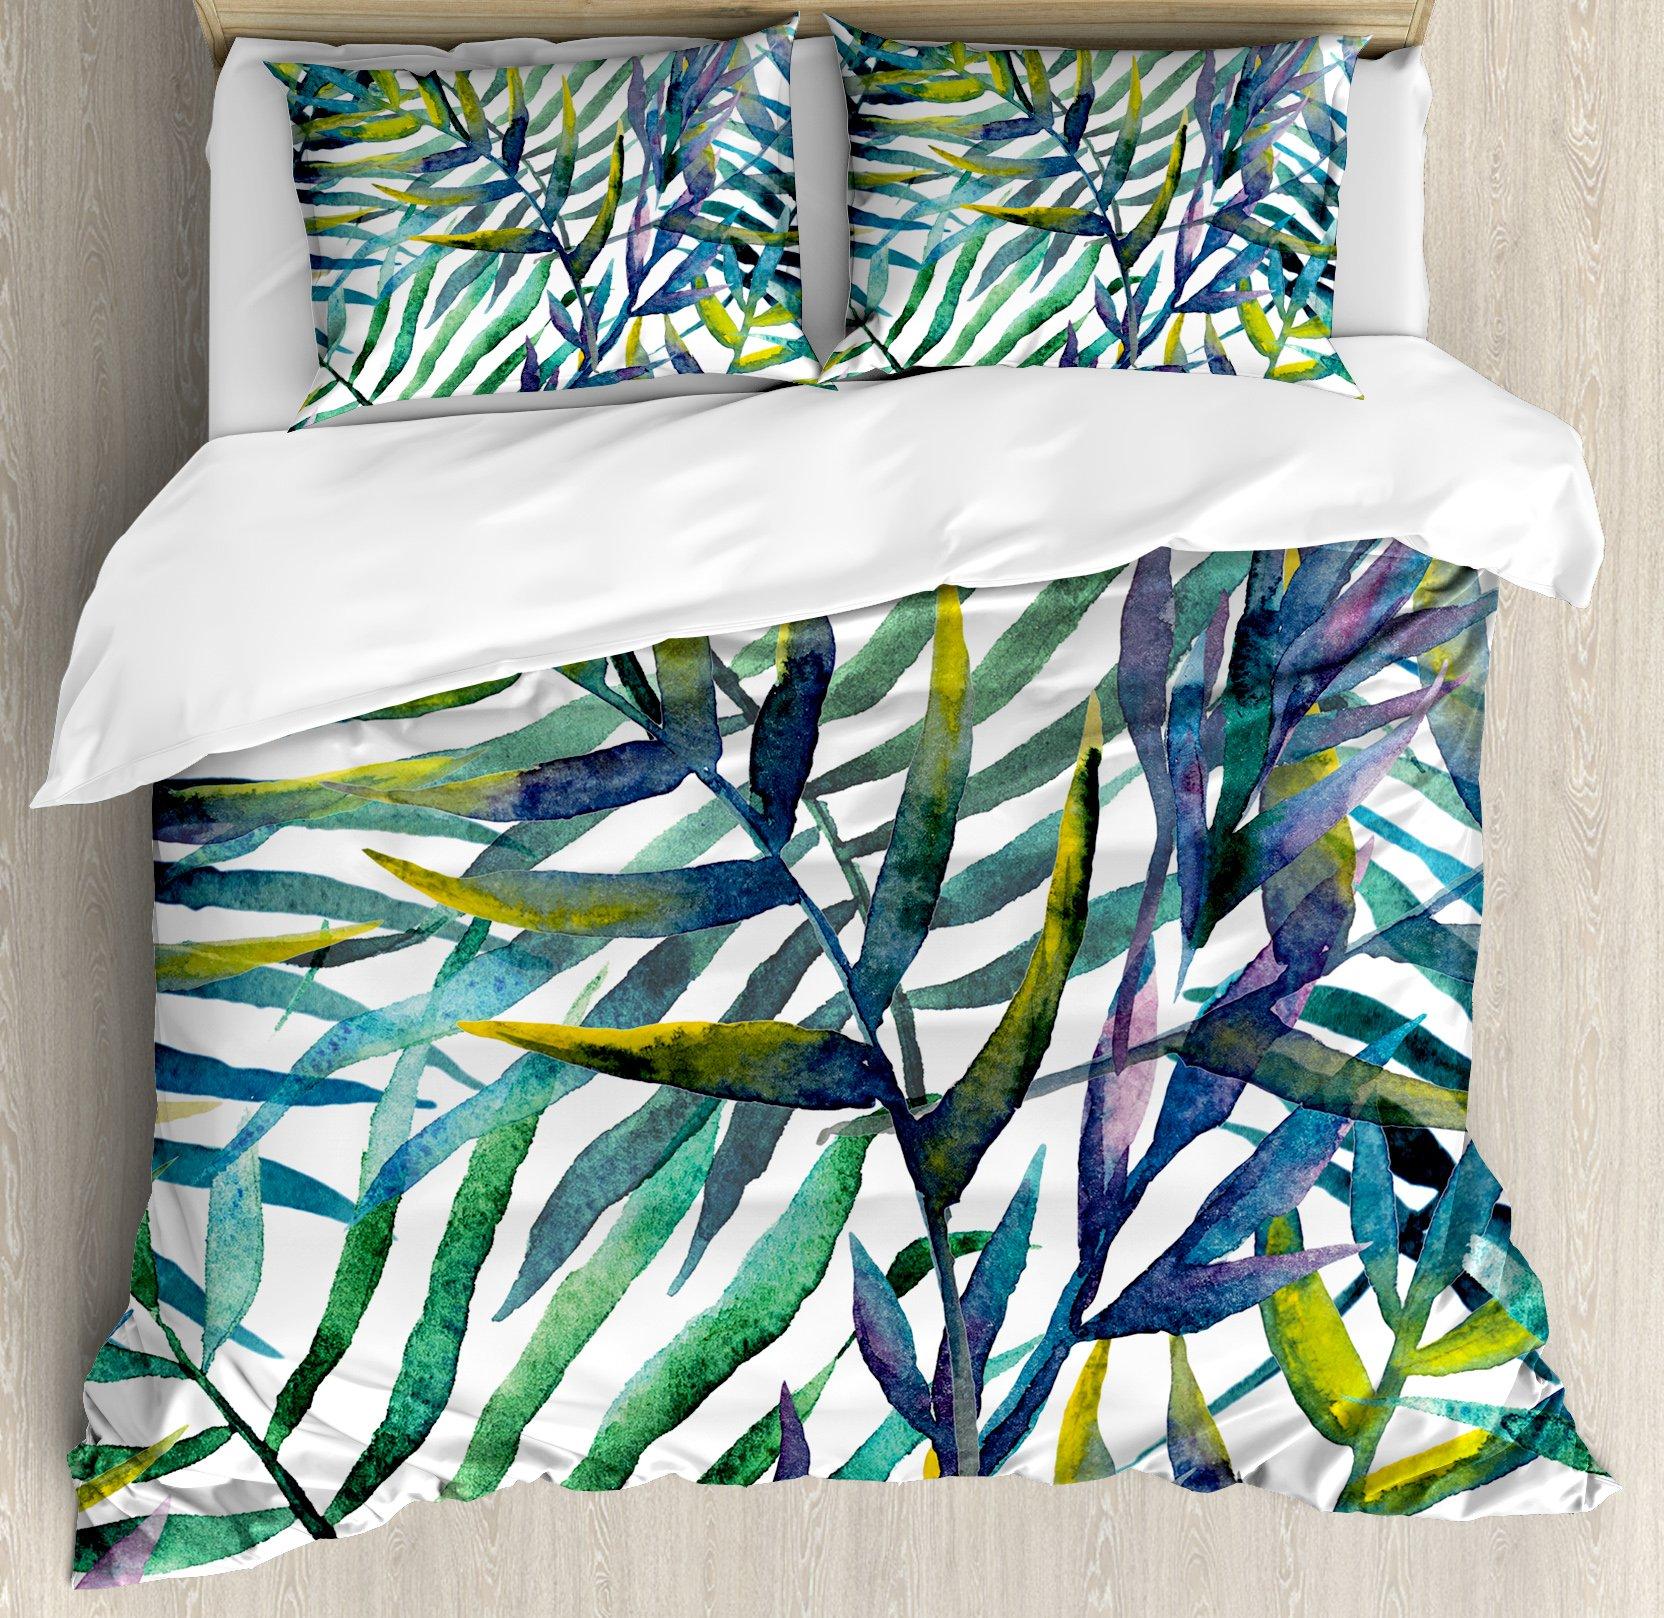 Ambesonne Leaf Duvet Cover Set Queen Size, Watercolor Artwork Tropical Island Vegetation Colorful Palm Leaves Nature Theme Art, Decorative 3 Piece Bedding Set 2 Pillow Shams, Green Purple